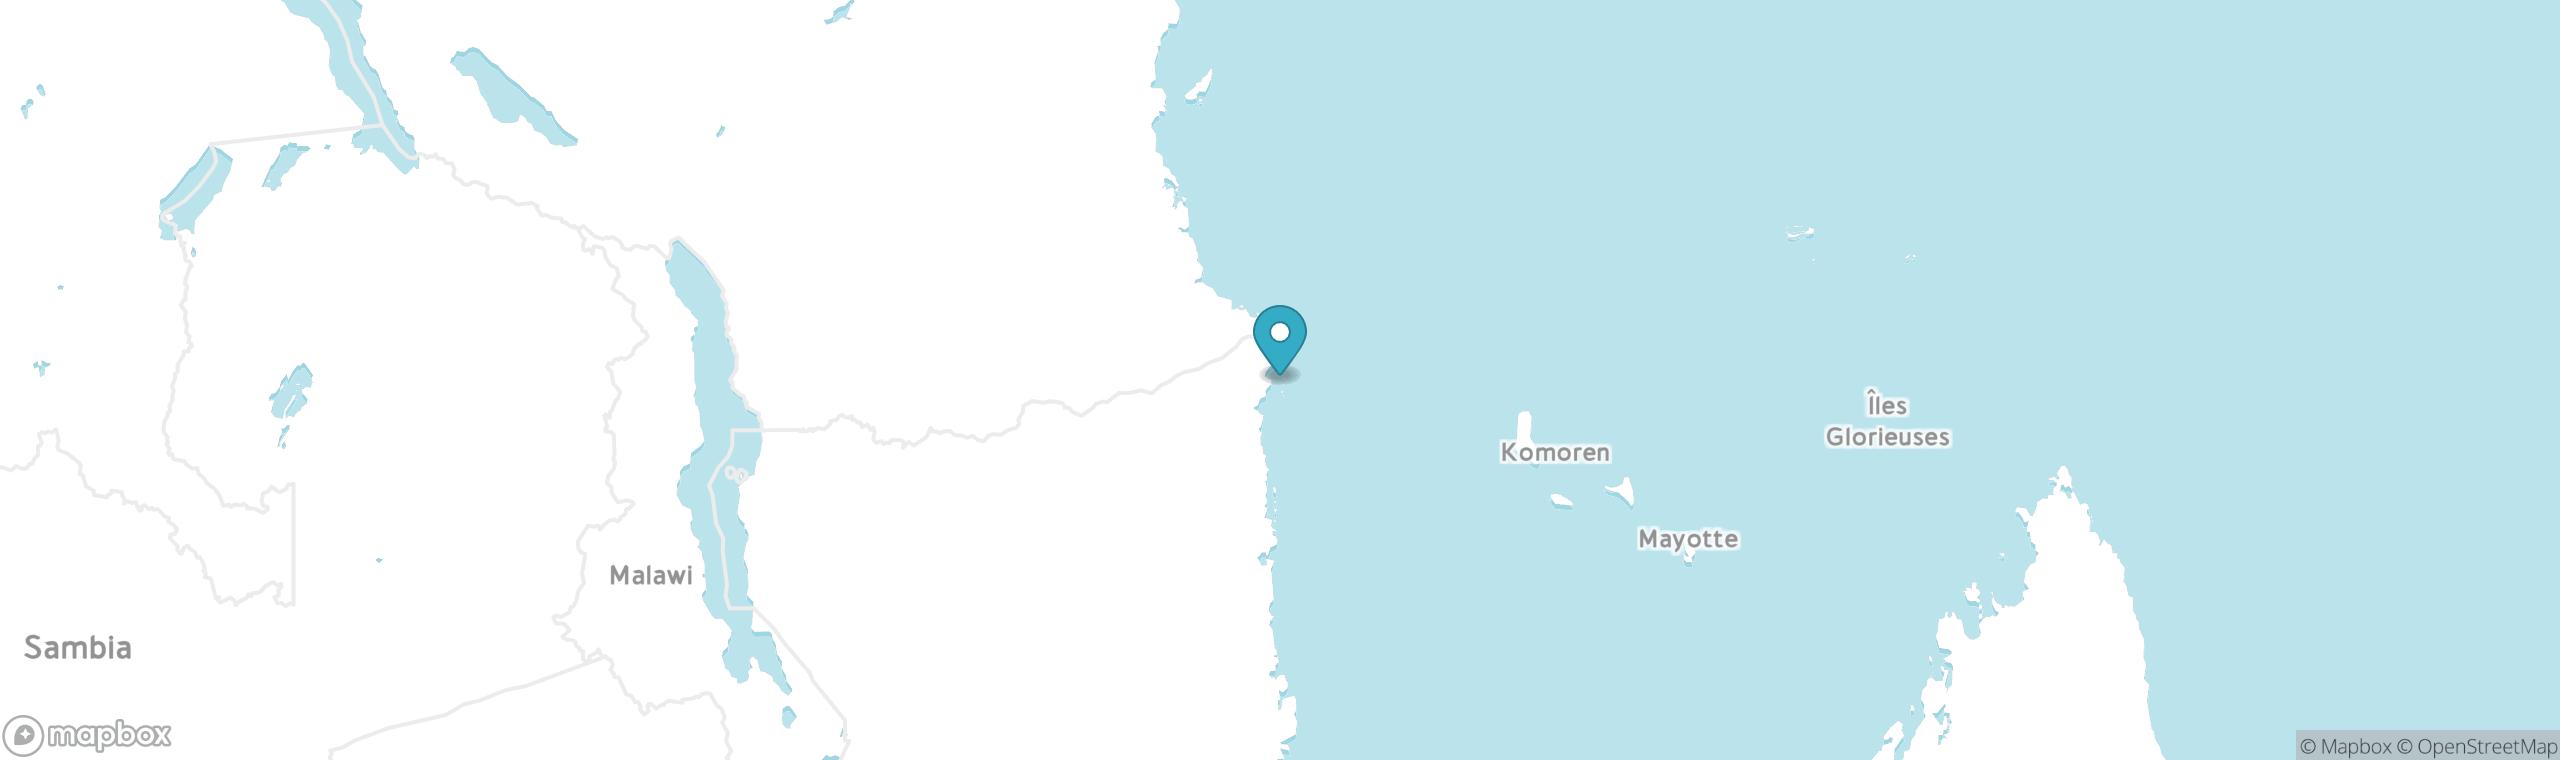 andBeyond Vamizi Island